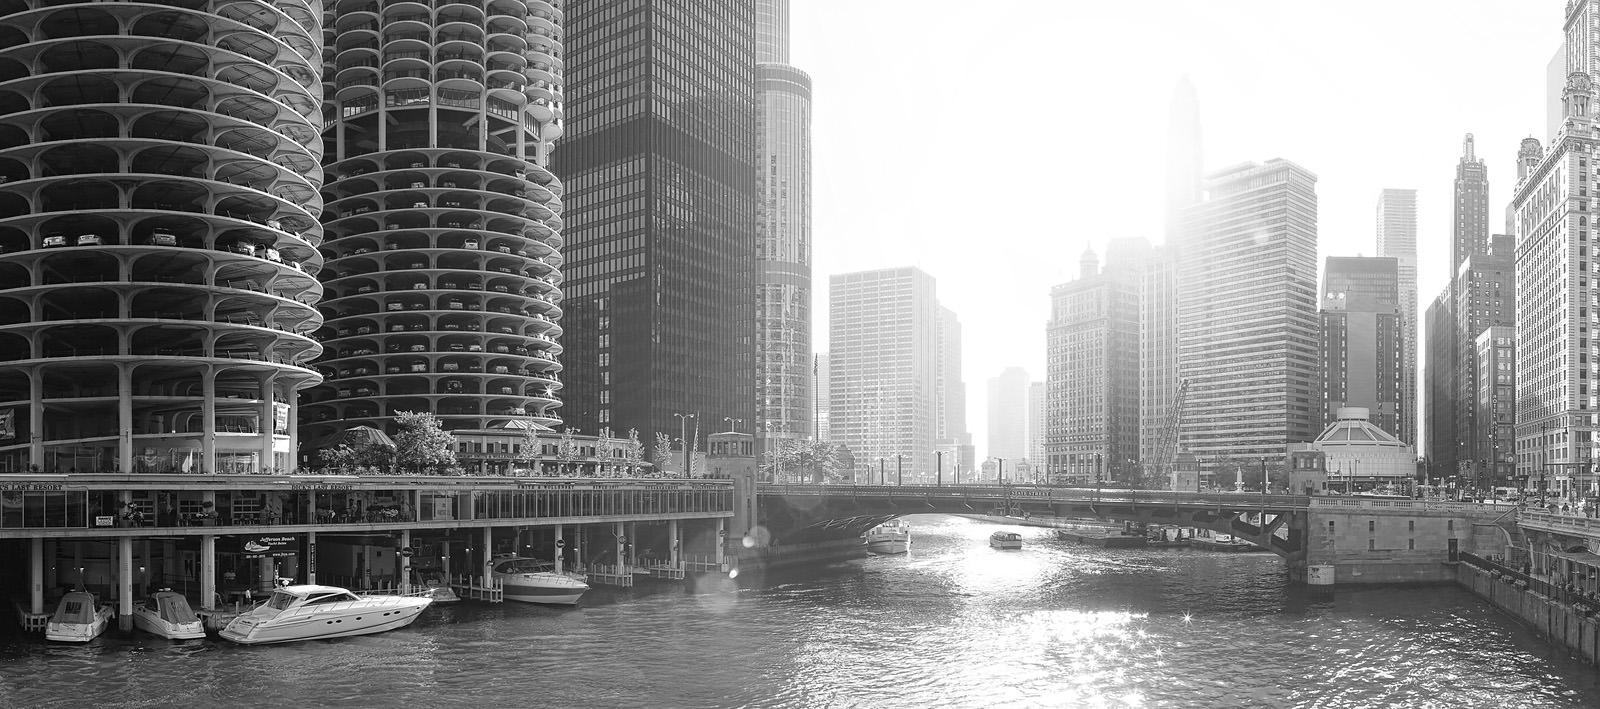 Chicago Sunlight Acrylic - Chicago Cityscape Print.